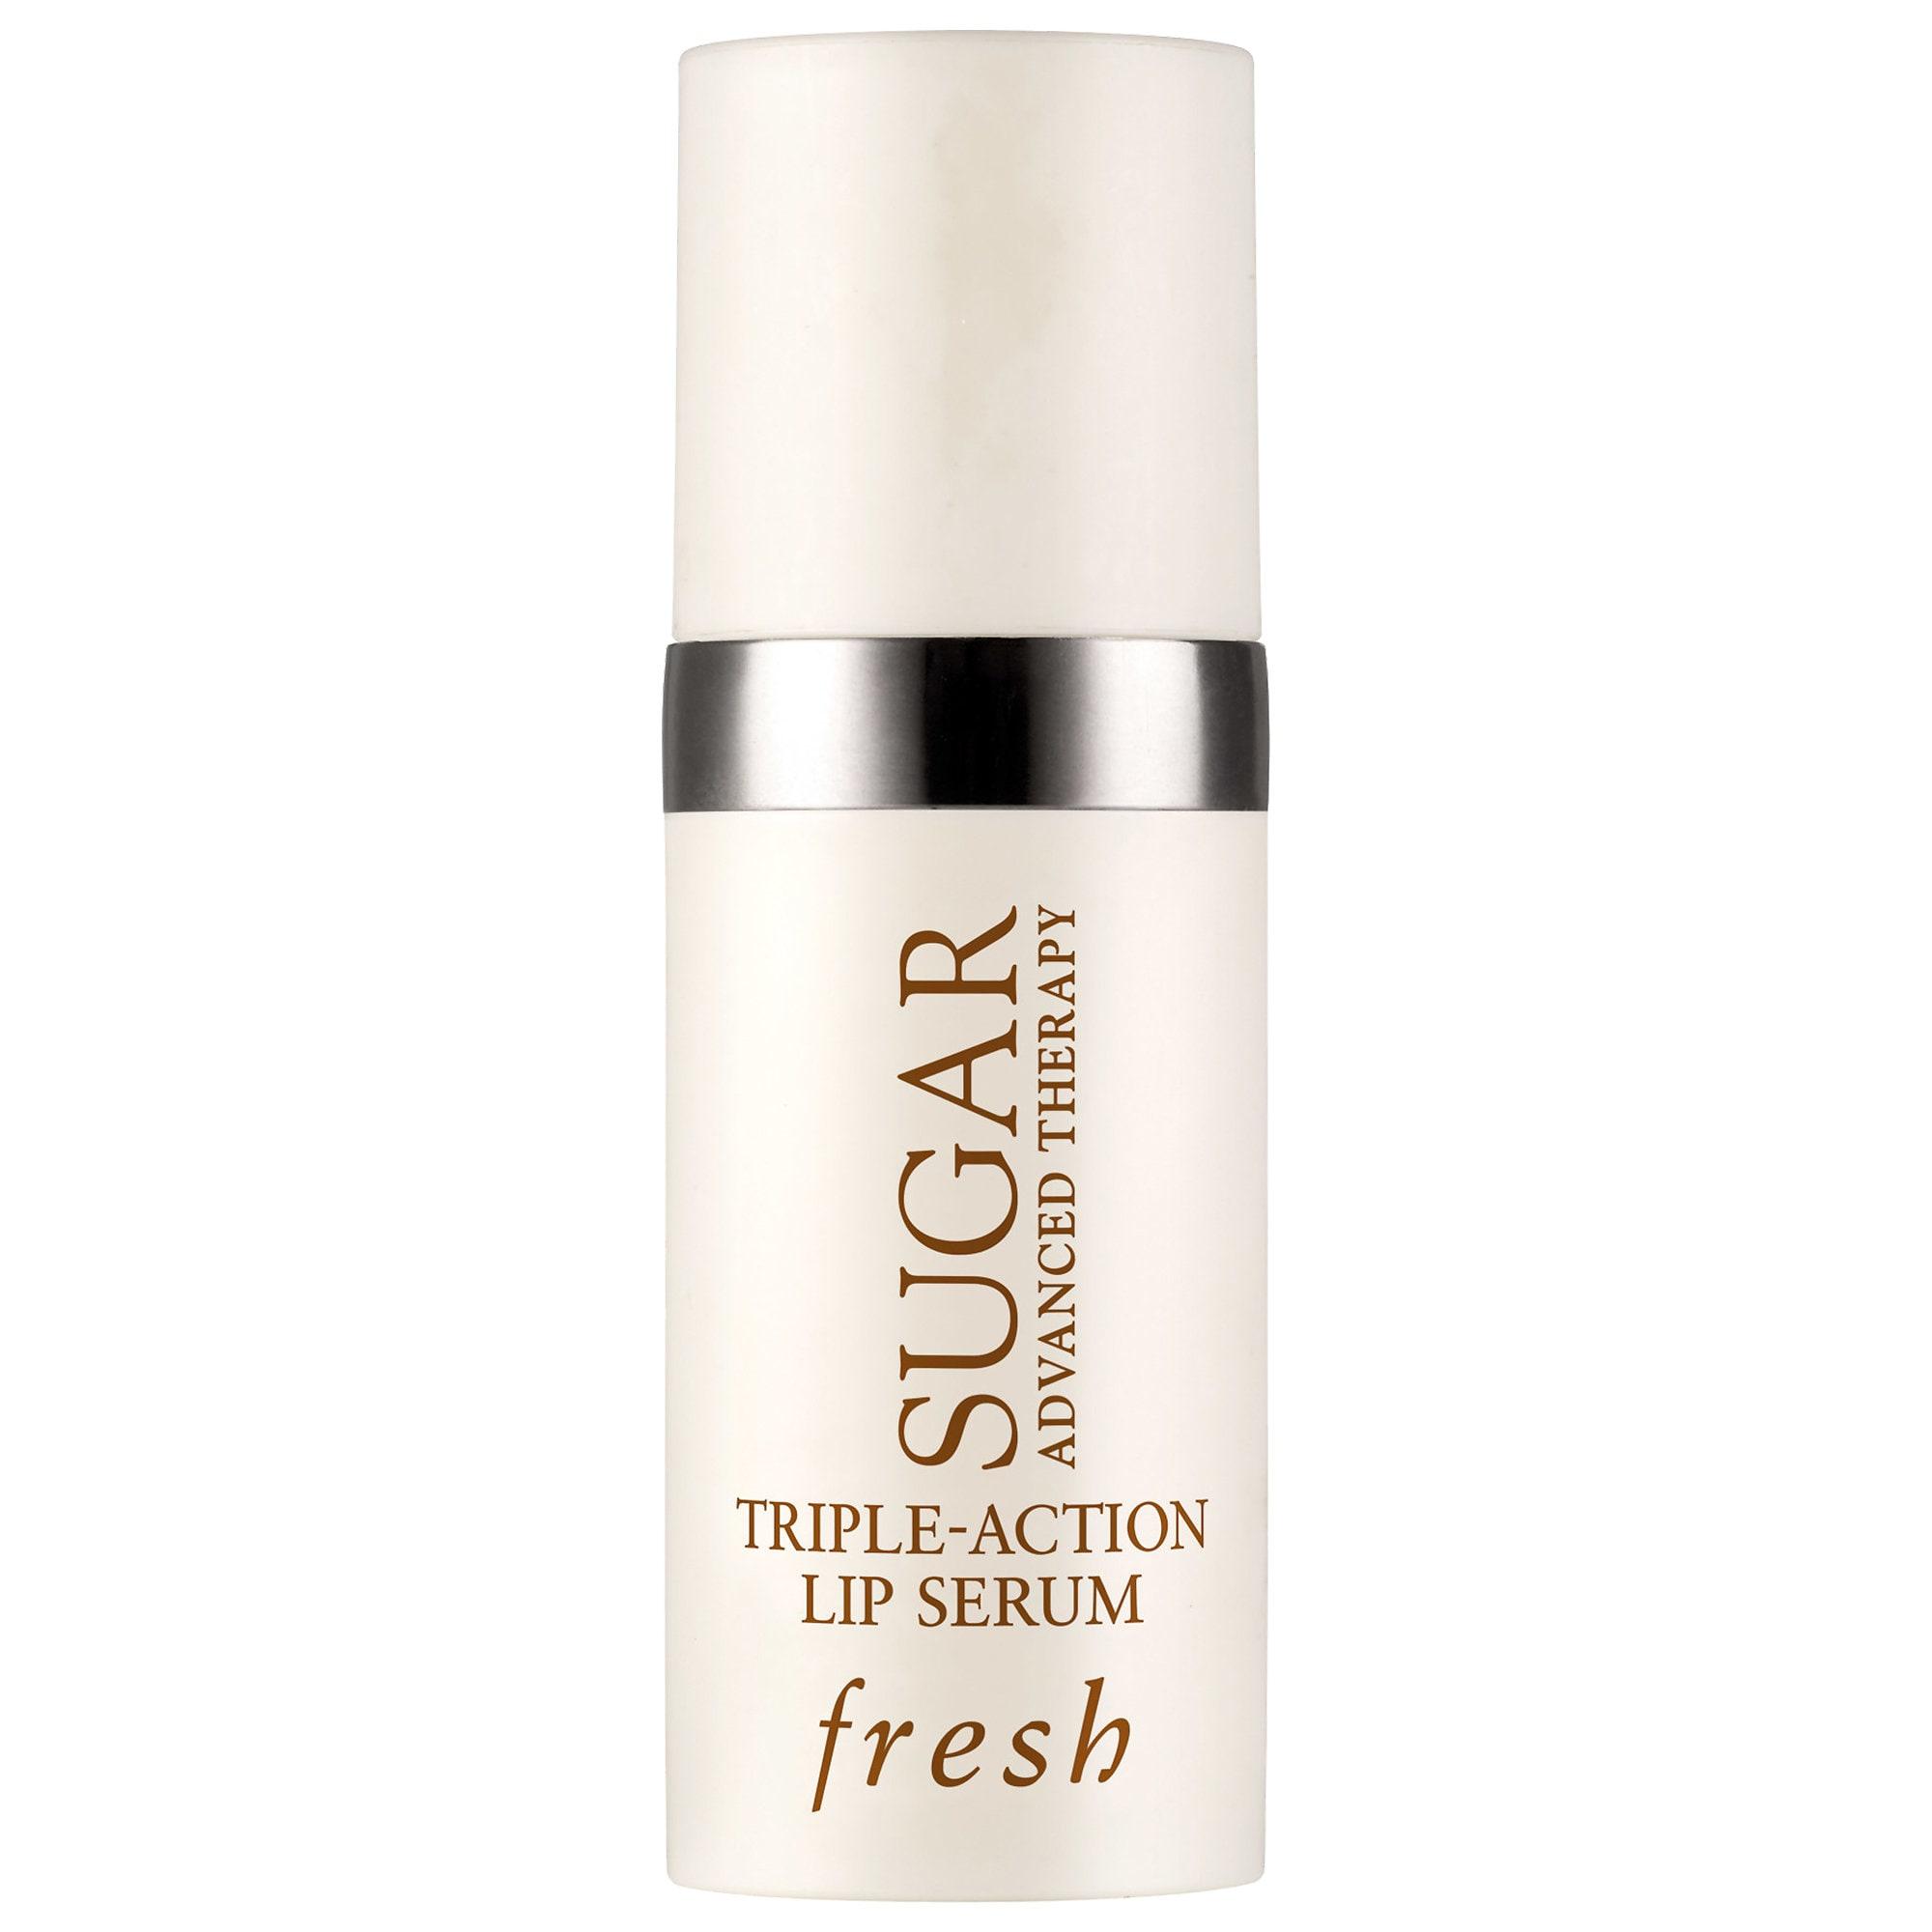 Fresh - Sugar Lip Serum Advanced Therapy